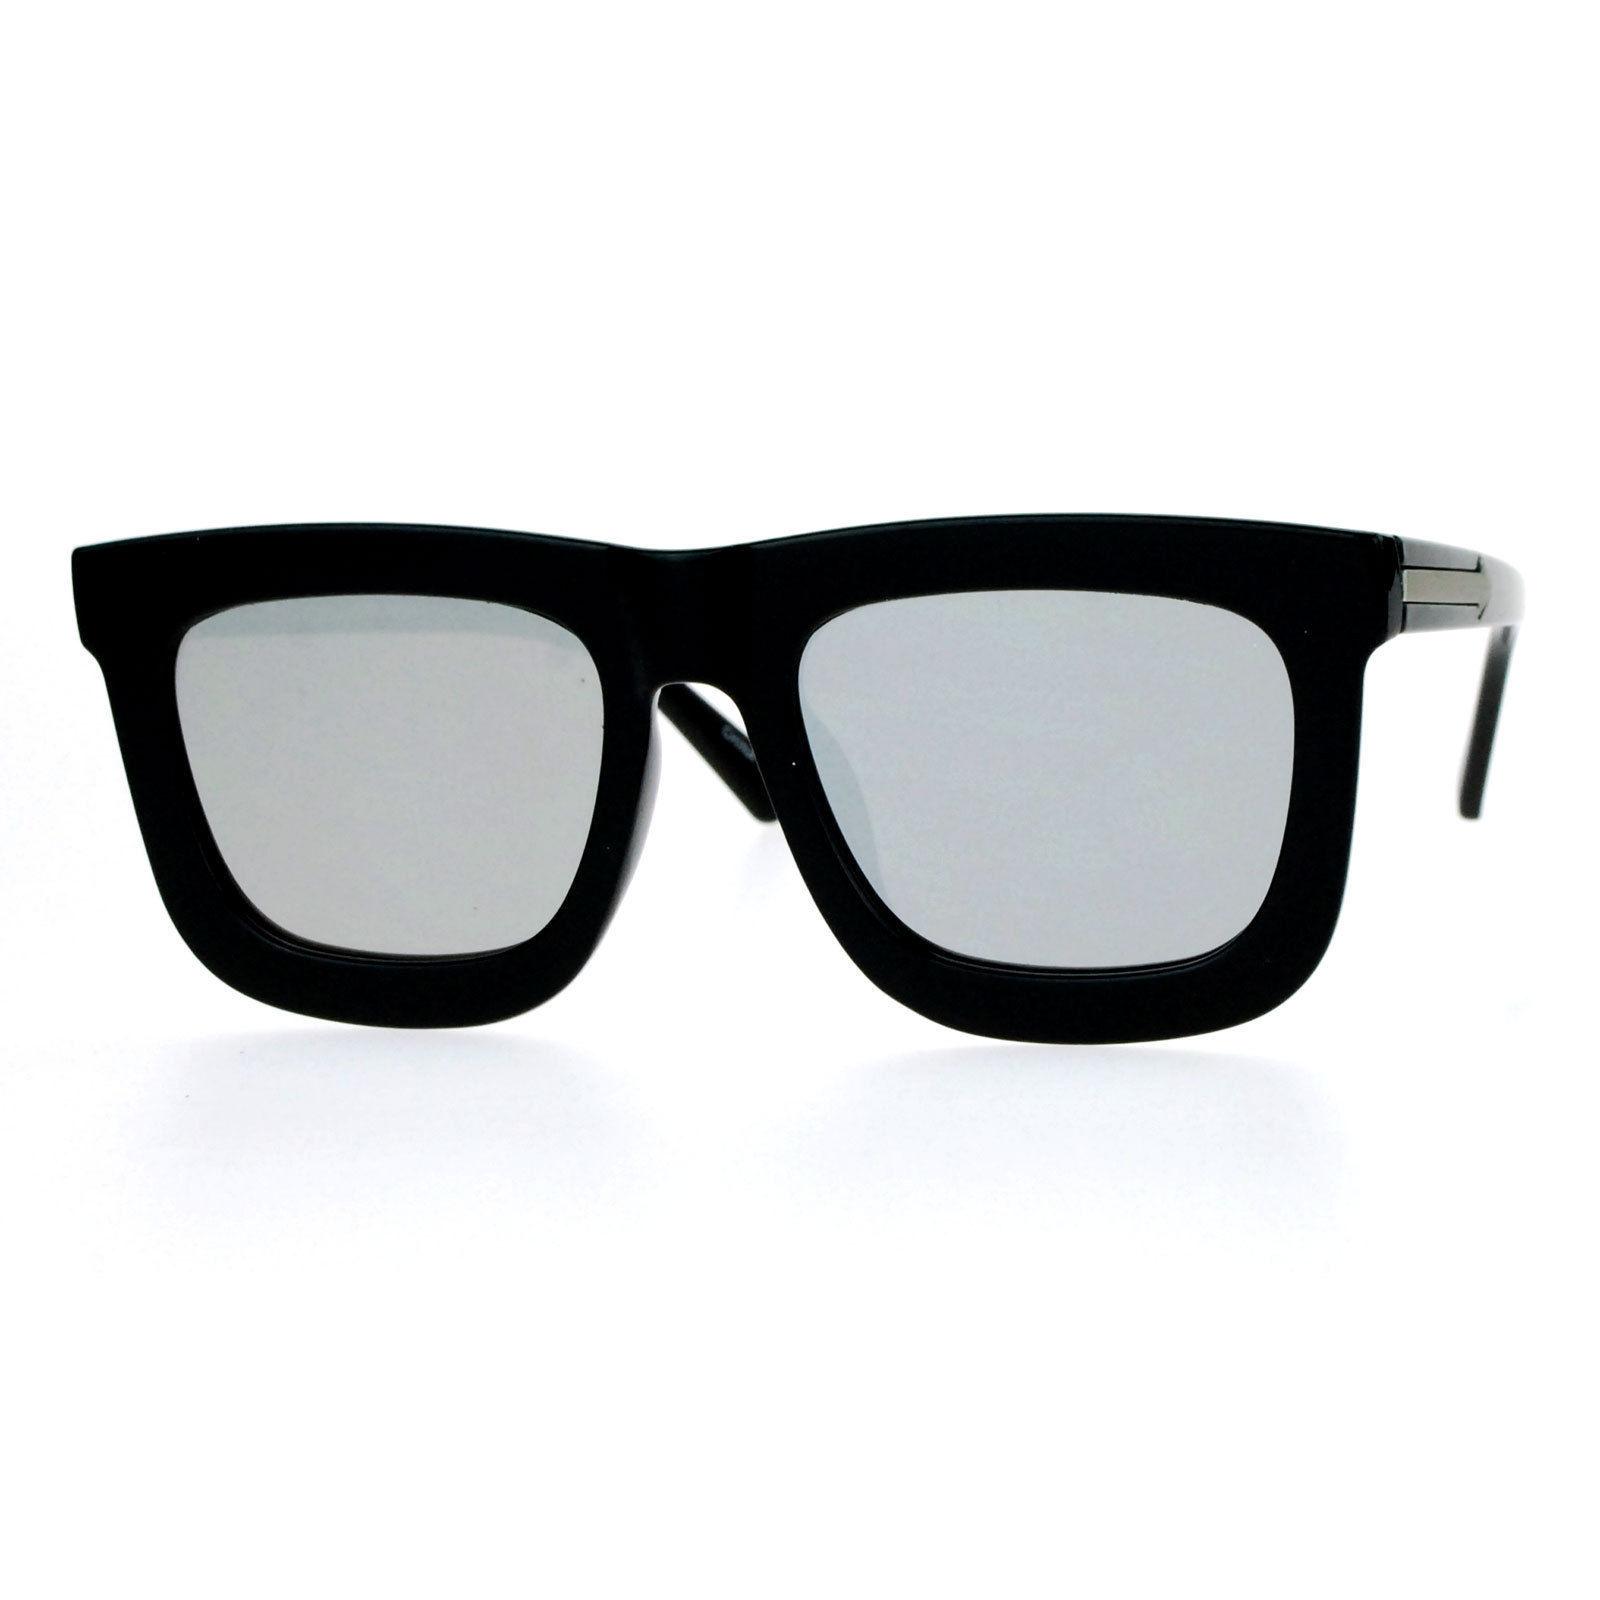 New Super Flat Lens Sunglasses Oversize Thick Square Frame Mirror Lens